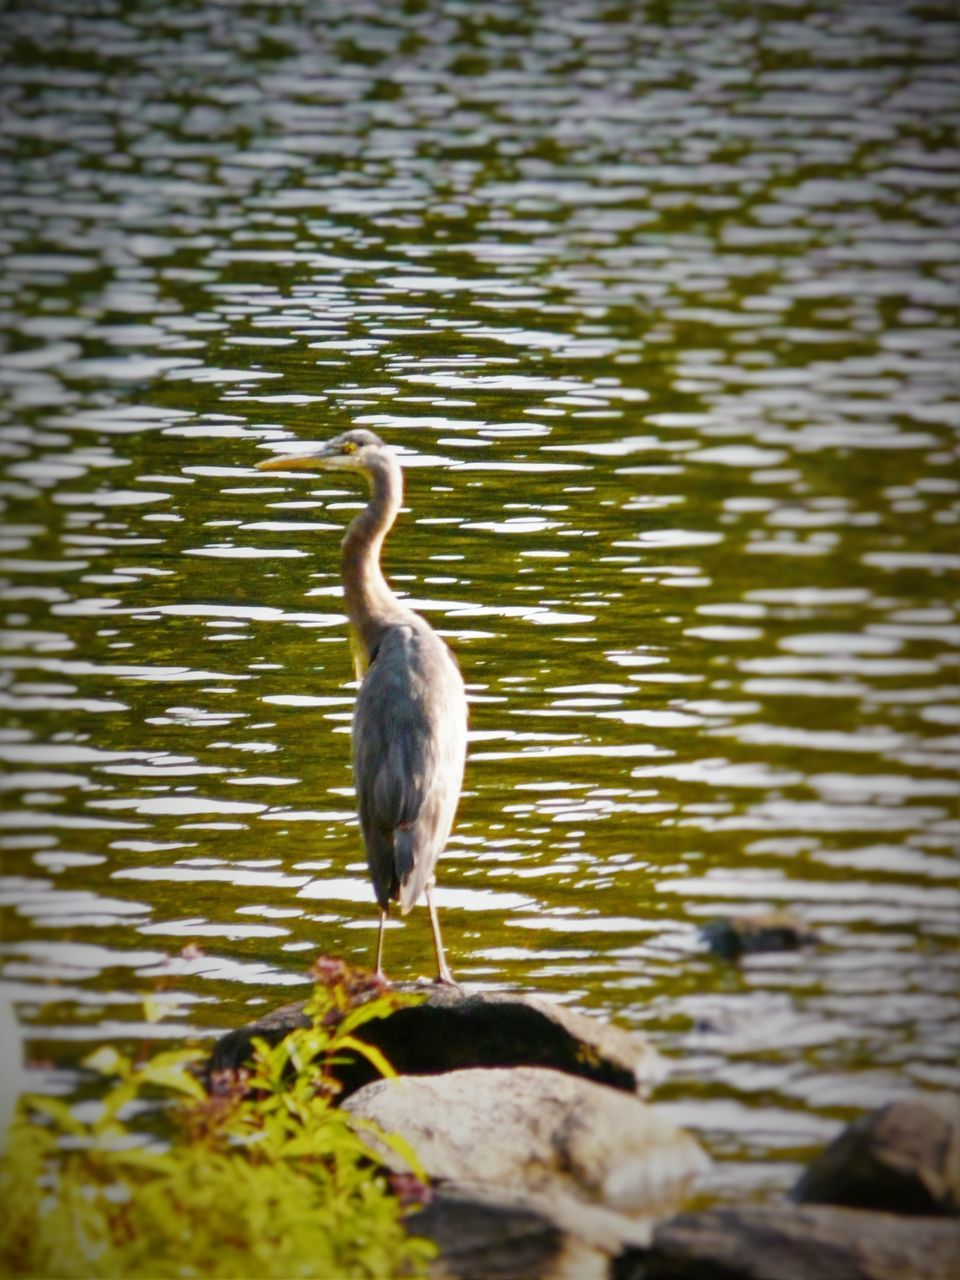 bird, one animal, animals in the wild, animal themes, animal wildlife, water, lake, nature, no people, outdoors, day, beak, perching